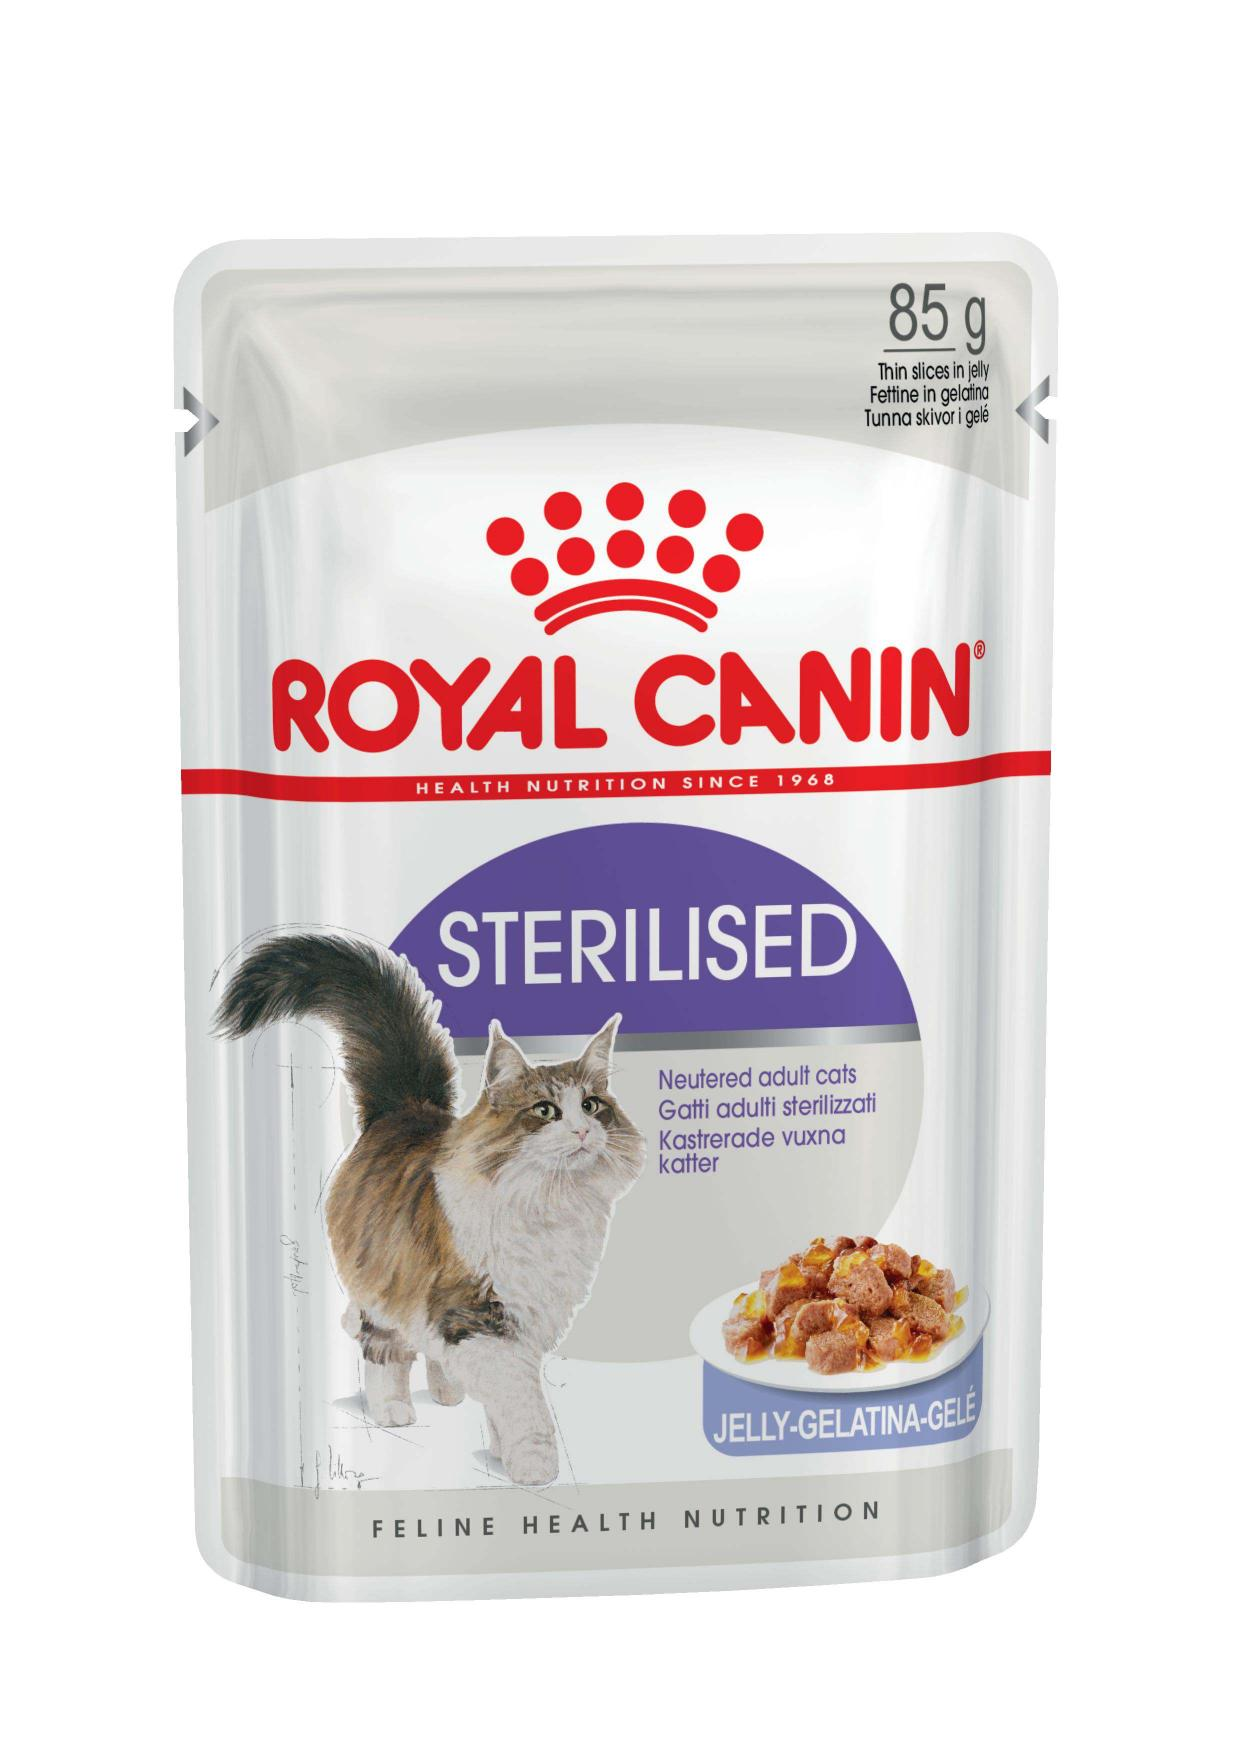 Royal Canin паучи ВИА см арт 41714 RC Кусочки в желе для кастрированных кошек 1-7лет (Sterilized) 787001, 0,085 кг, 24172